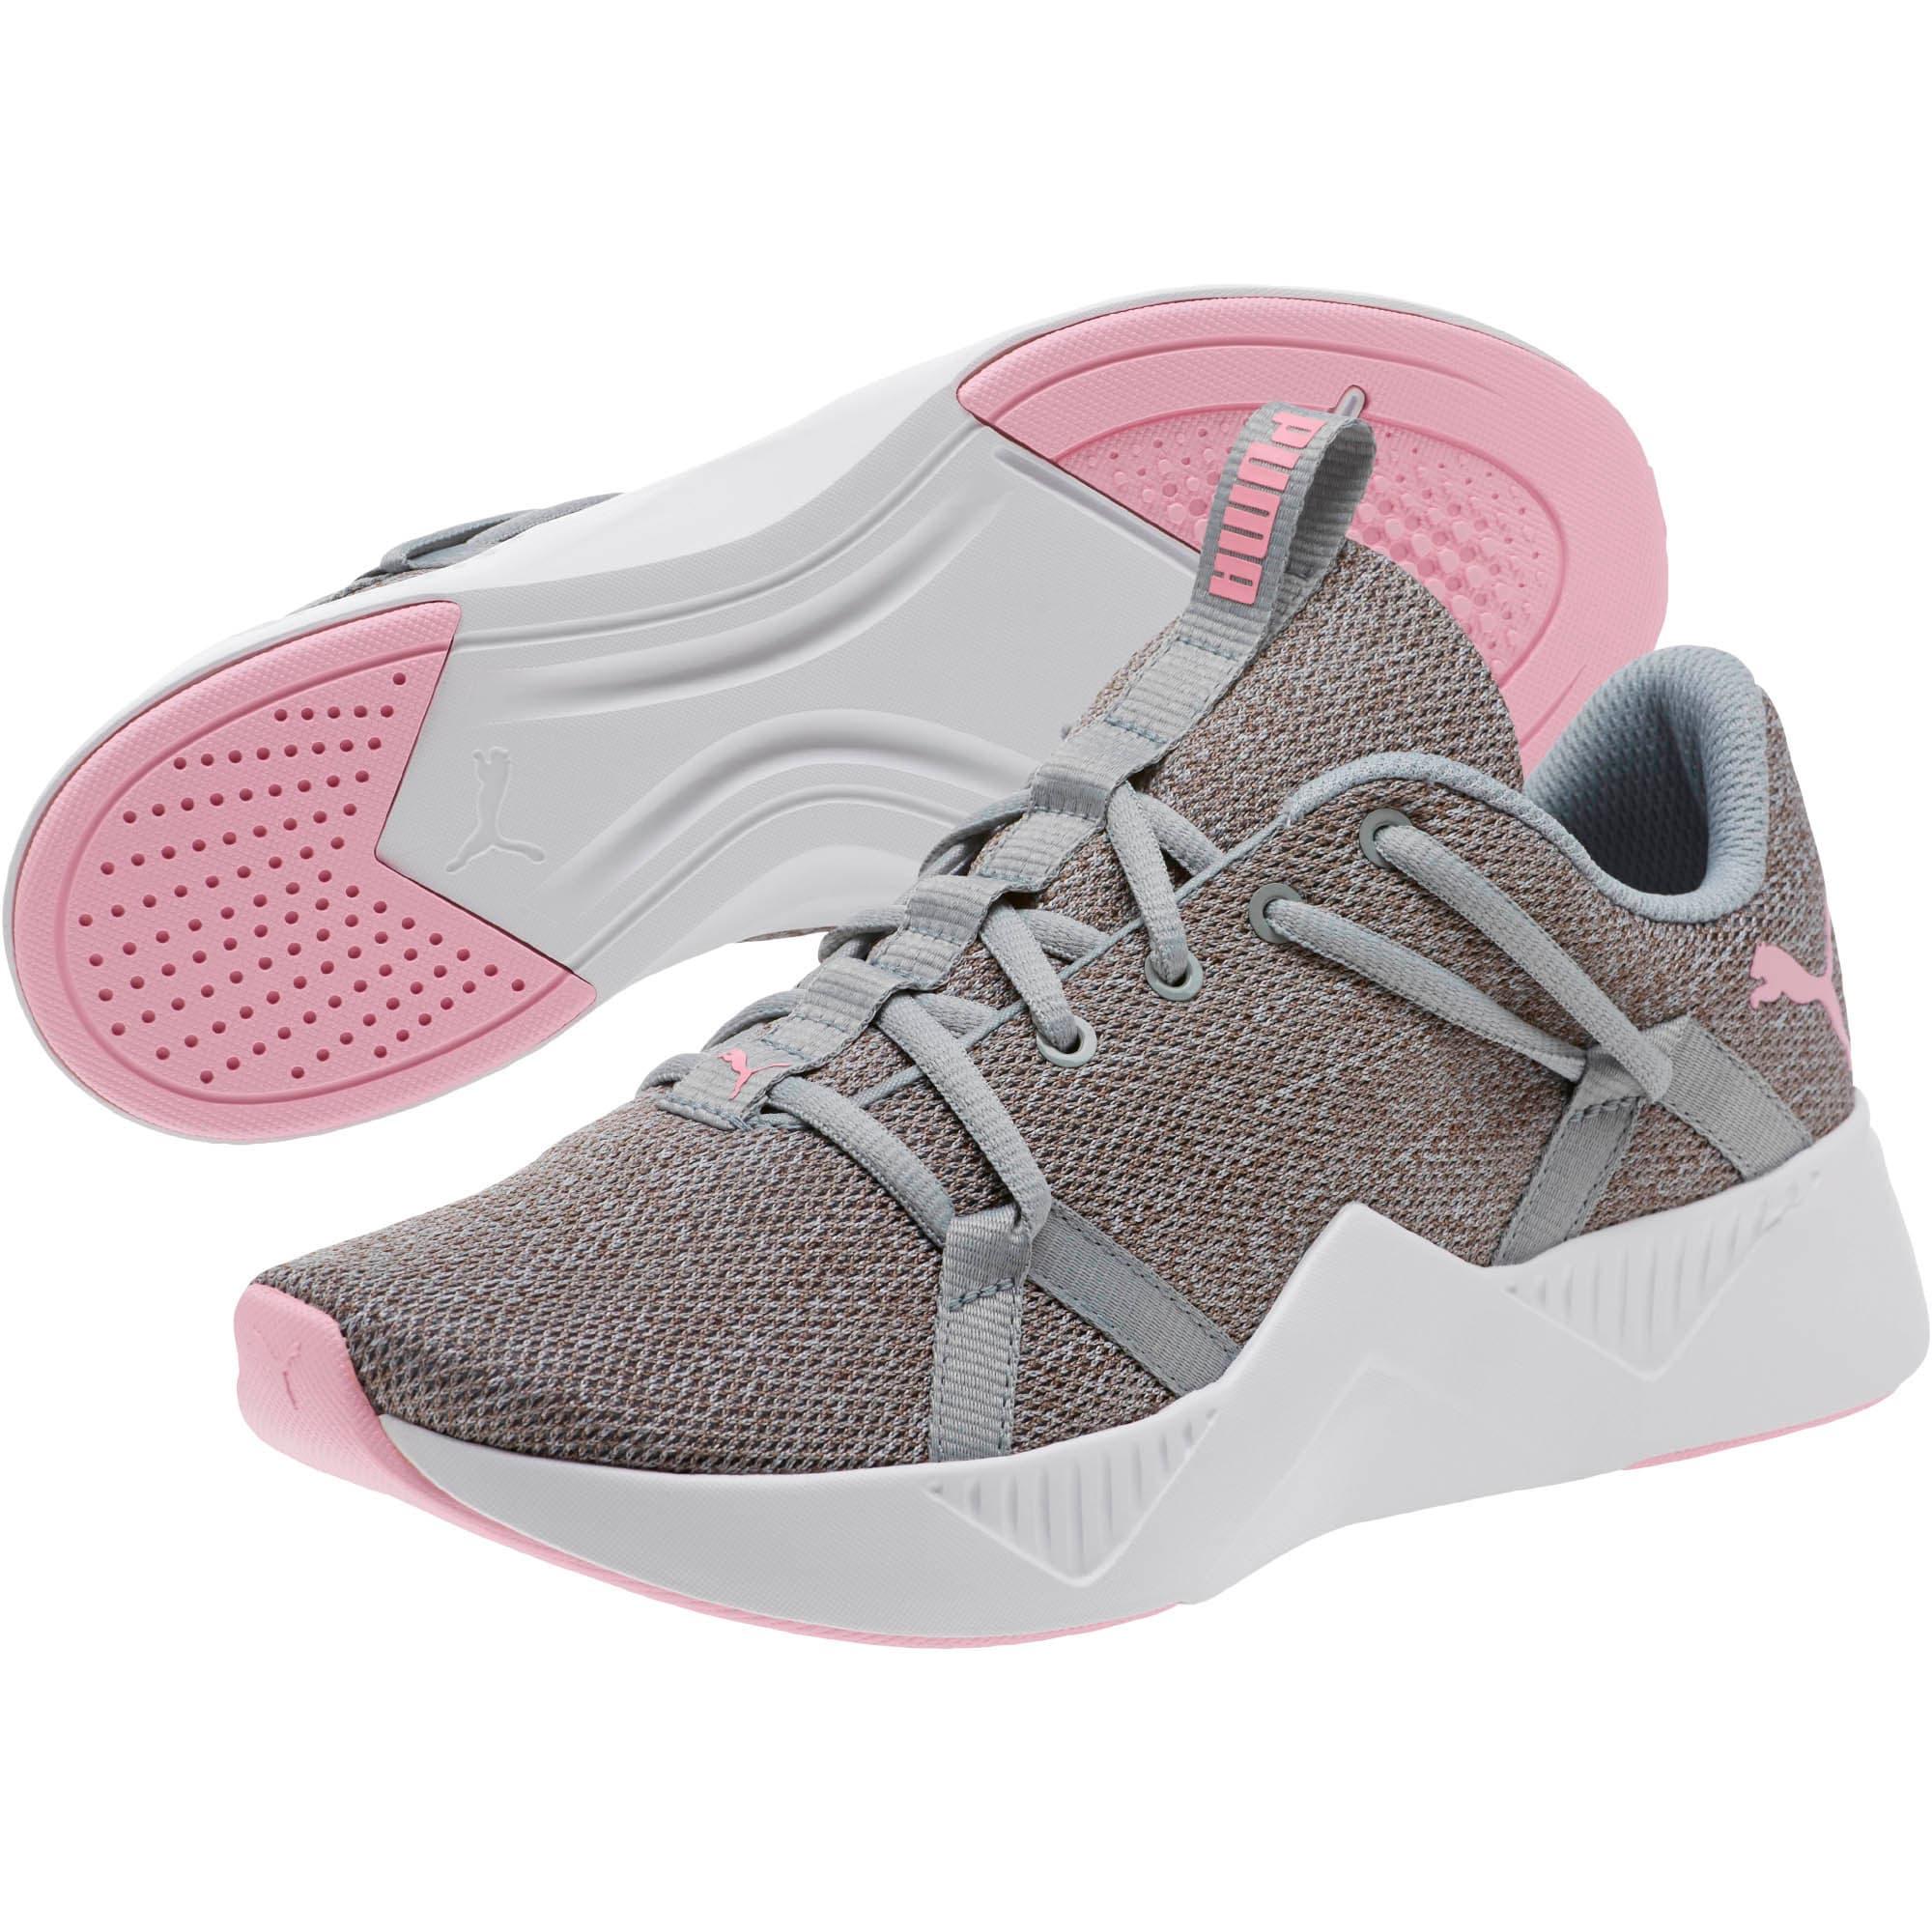 Thumbnail 2 of Incite Knit Women's Training Shoes, Quarry-Pale Pink, medium